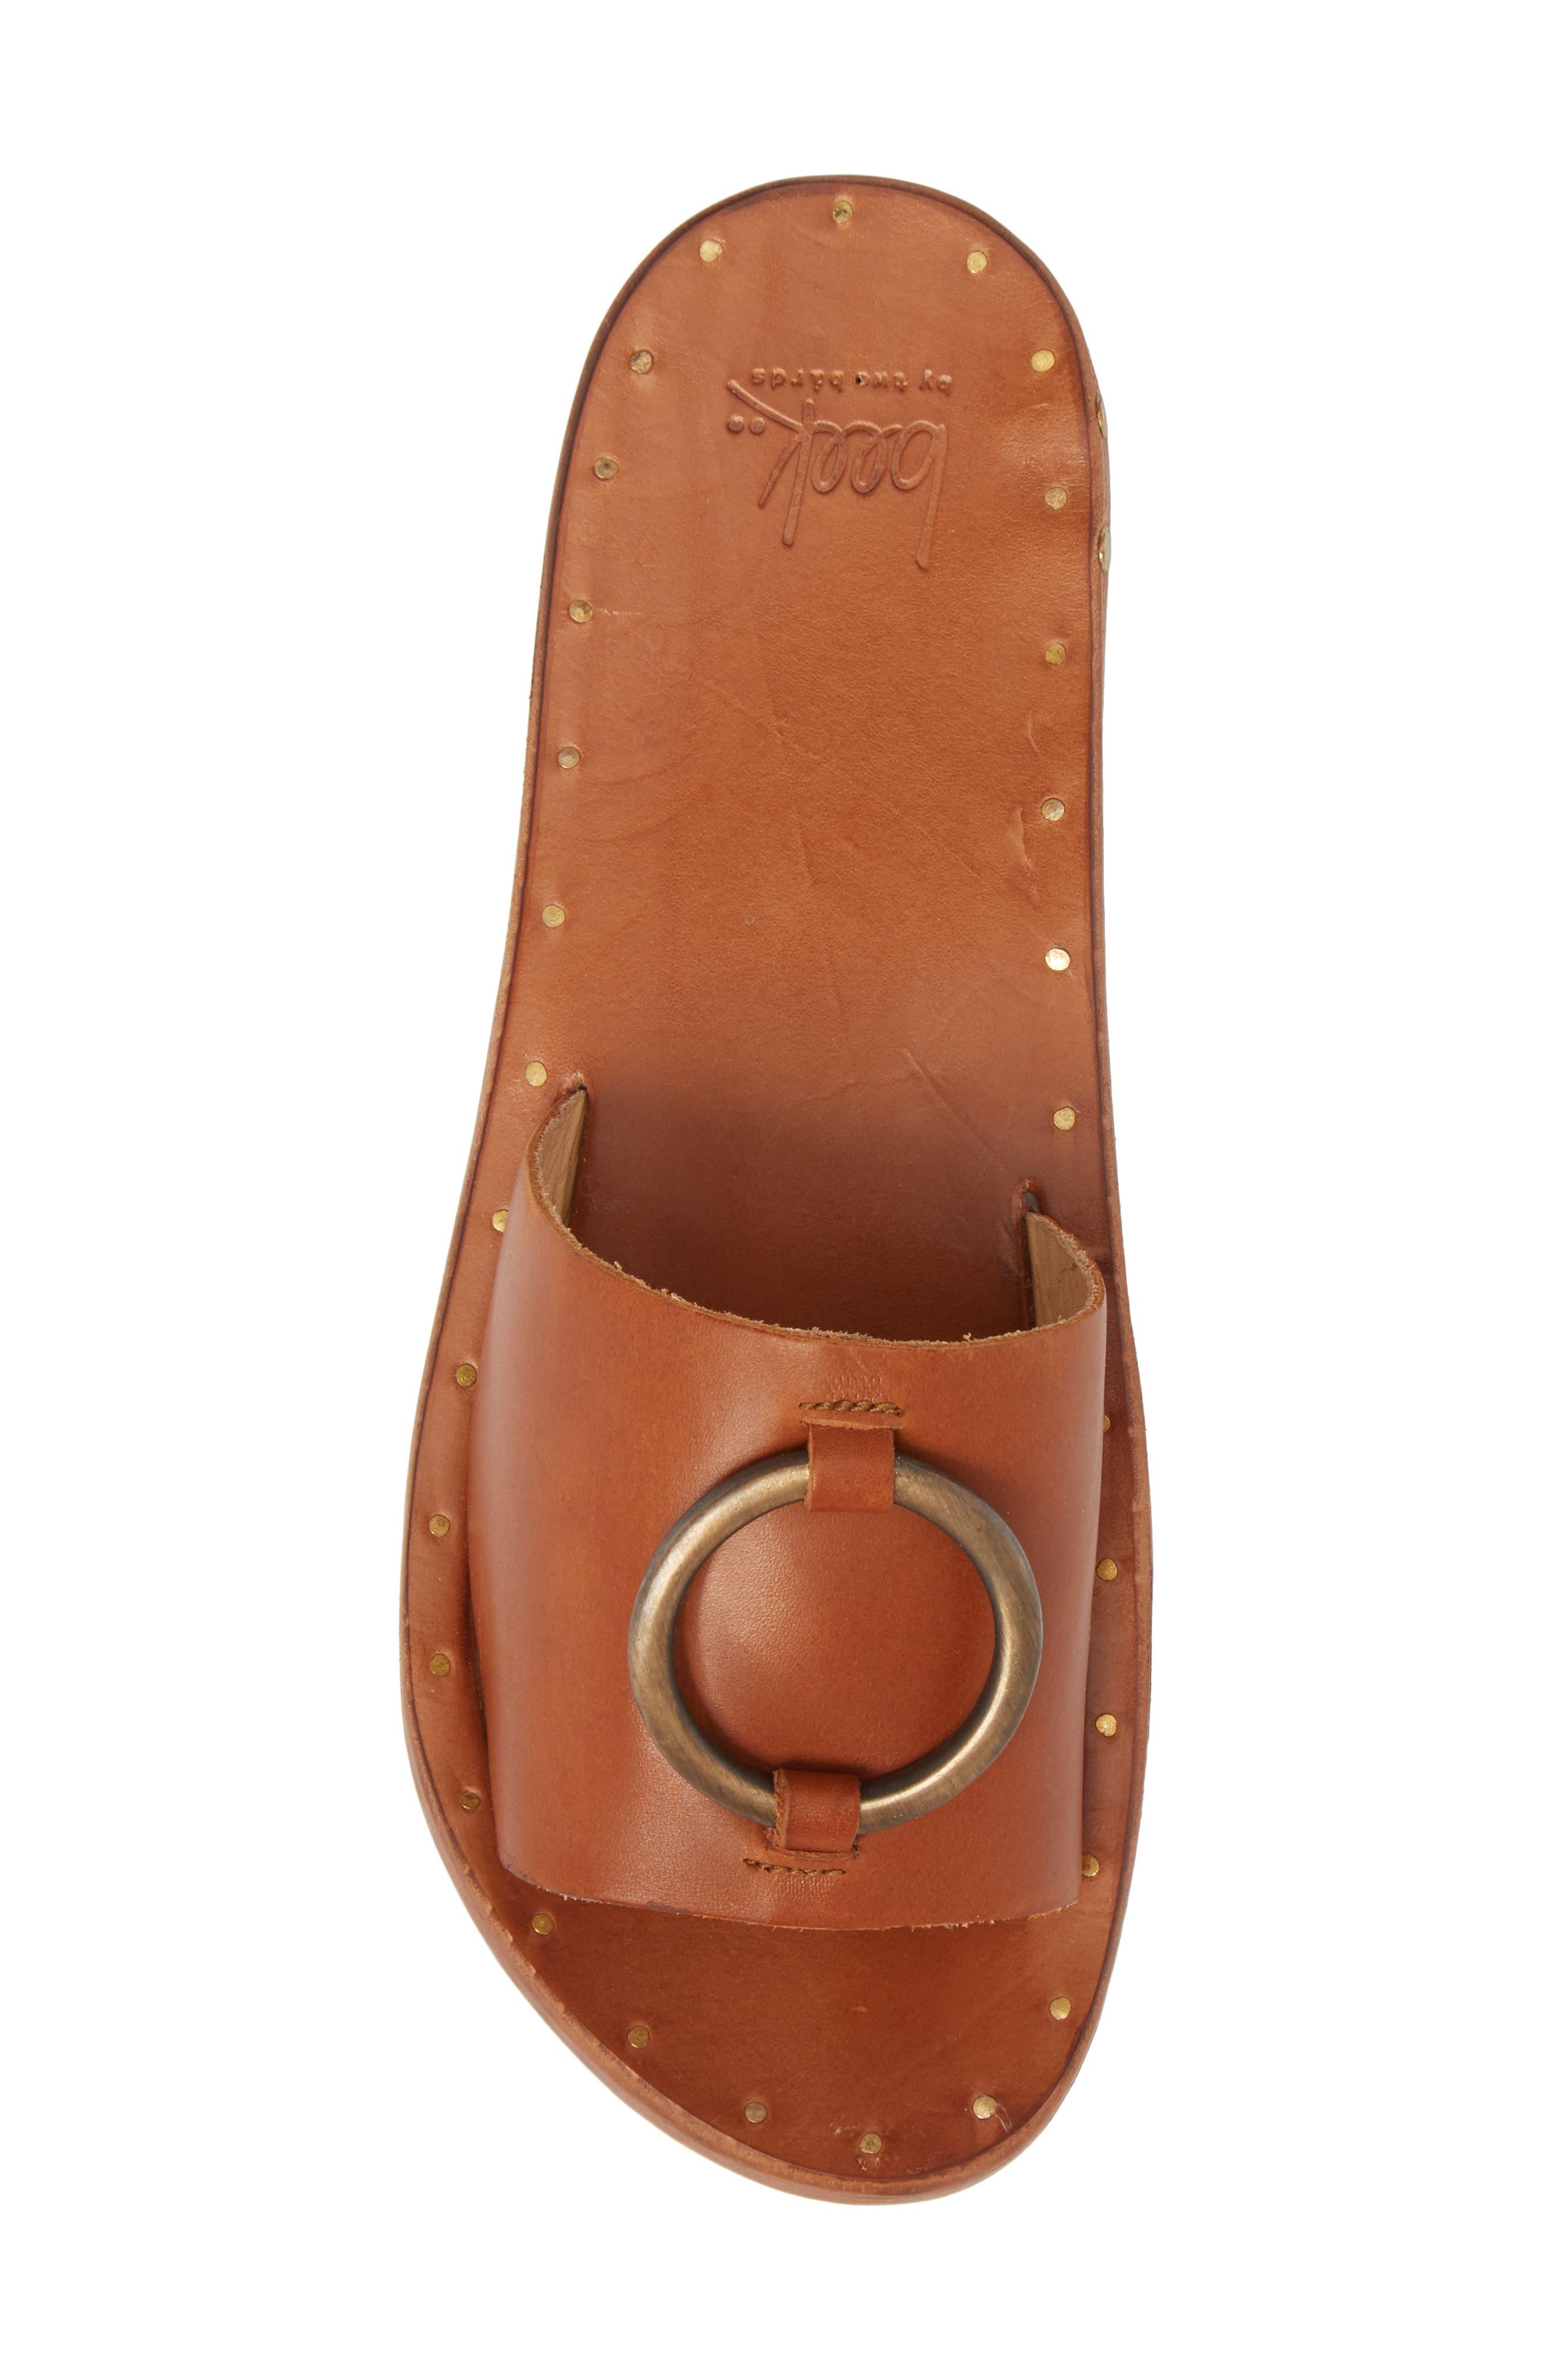 Cockatoo Slide Sandal,                             Alternate thumbnail 5, color,                             Tan/ Tan